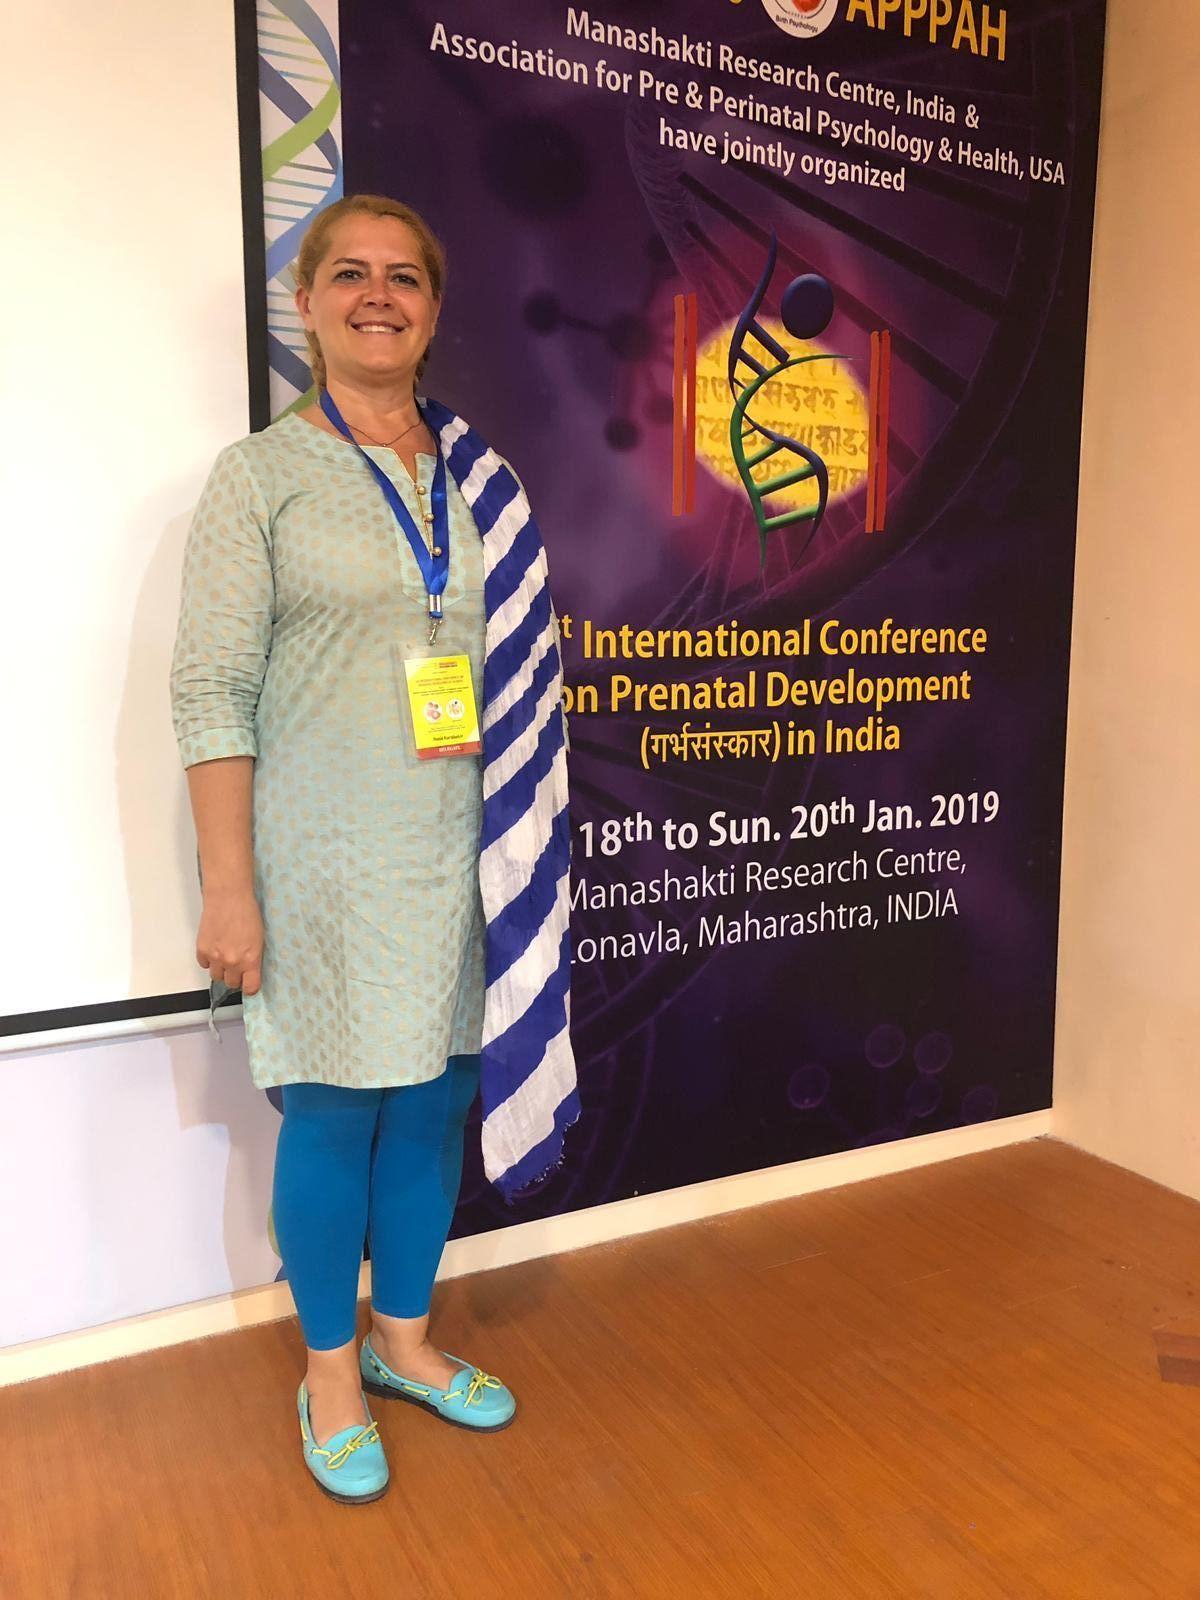 Hindistan 1. Prenatal Development Kongresi